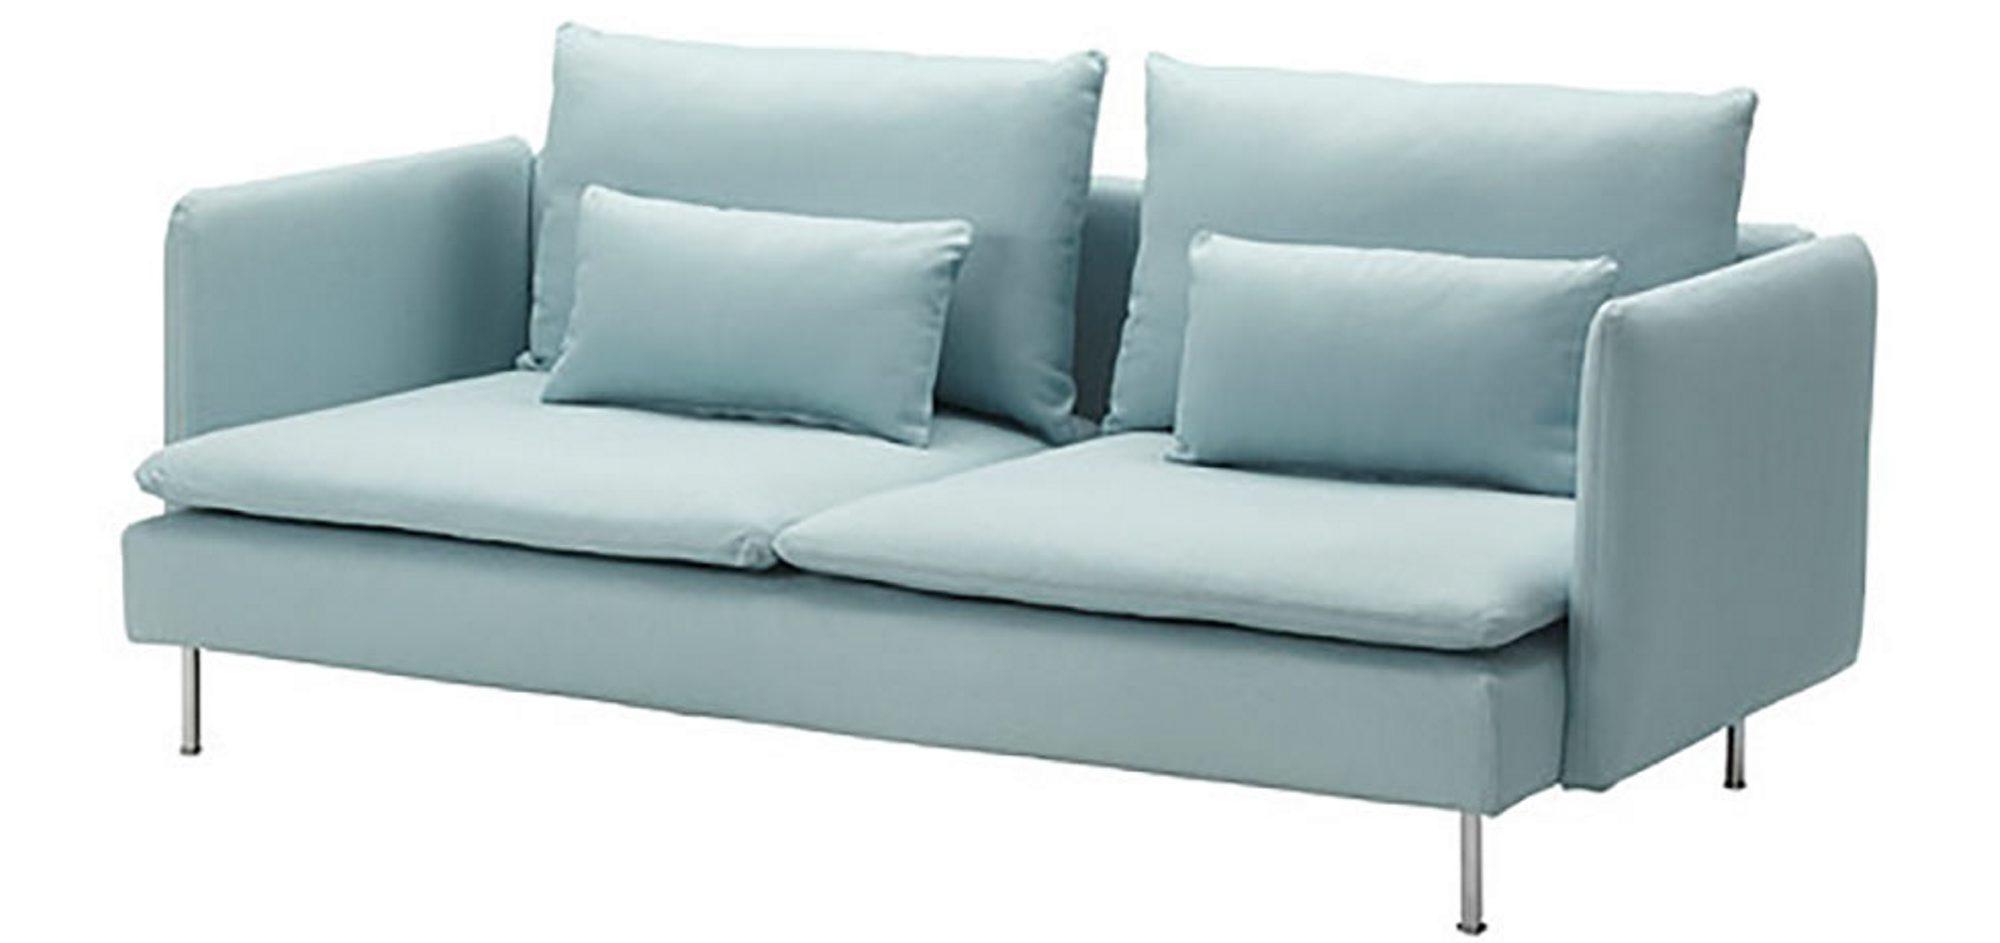 sofa med personlighet rom123. Black Bedroom Furniture Sets. Home Design Ideas